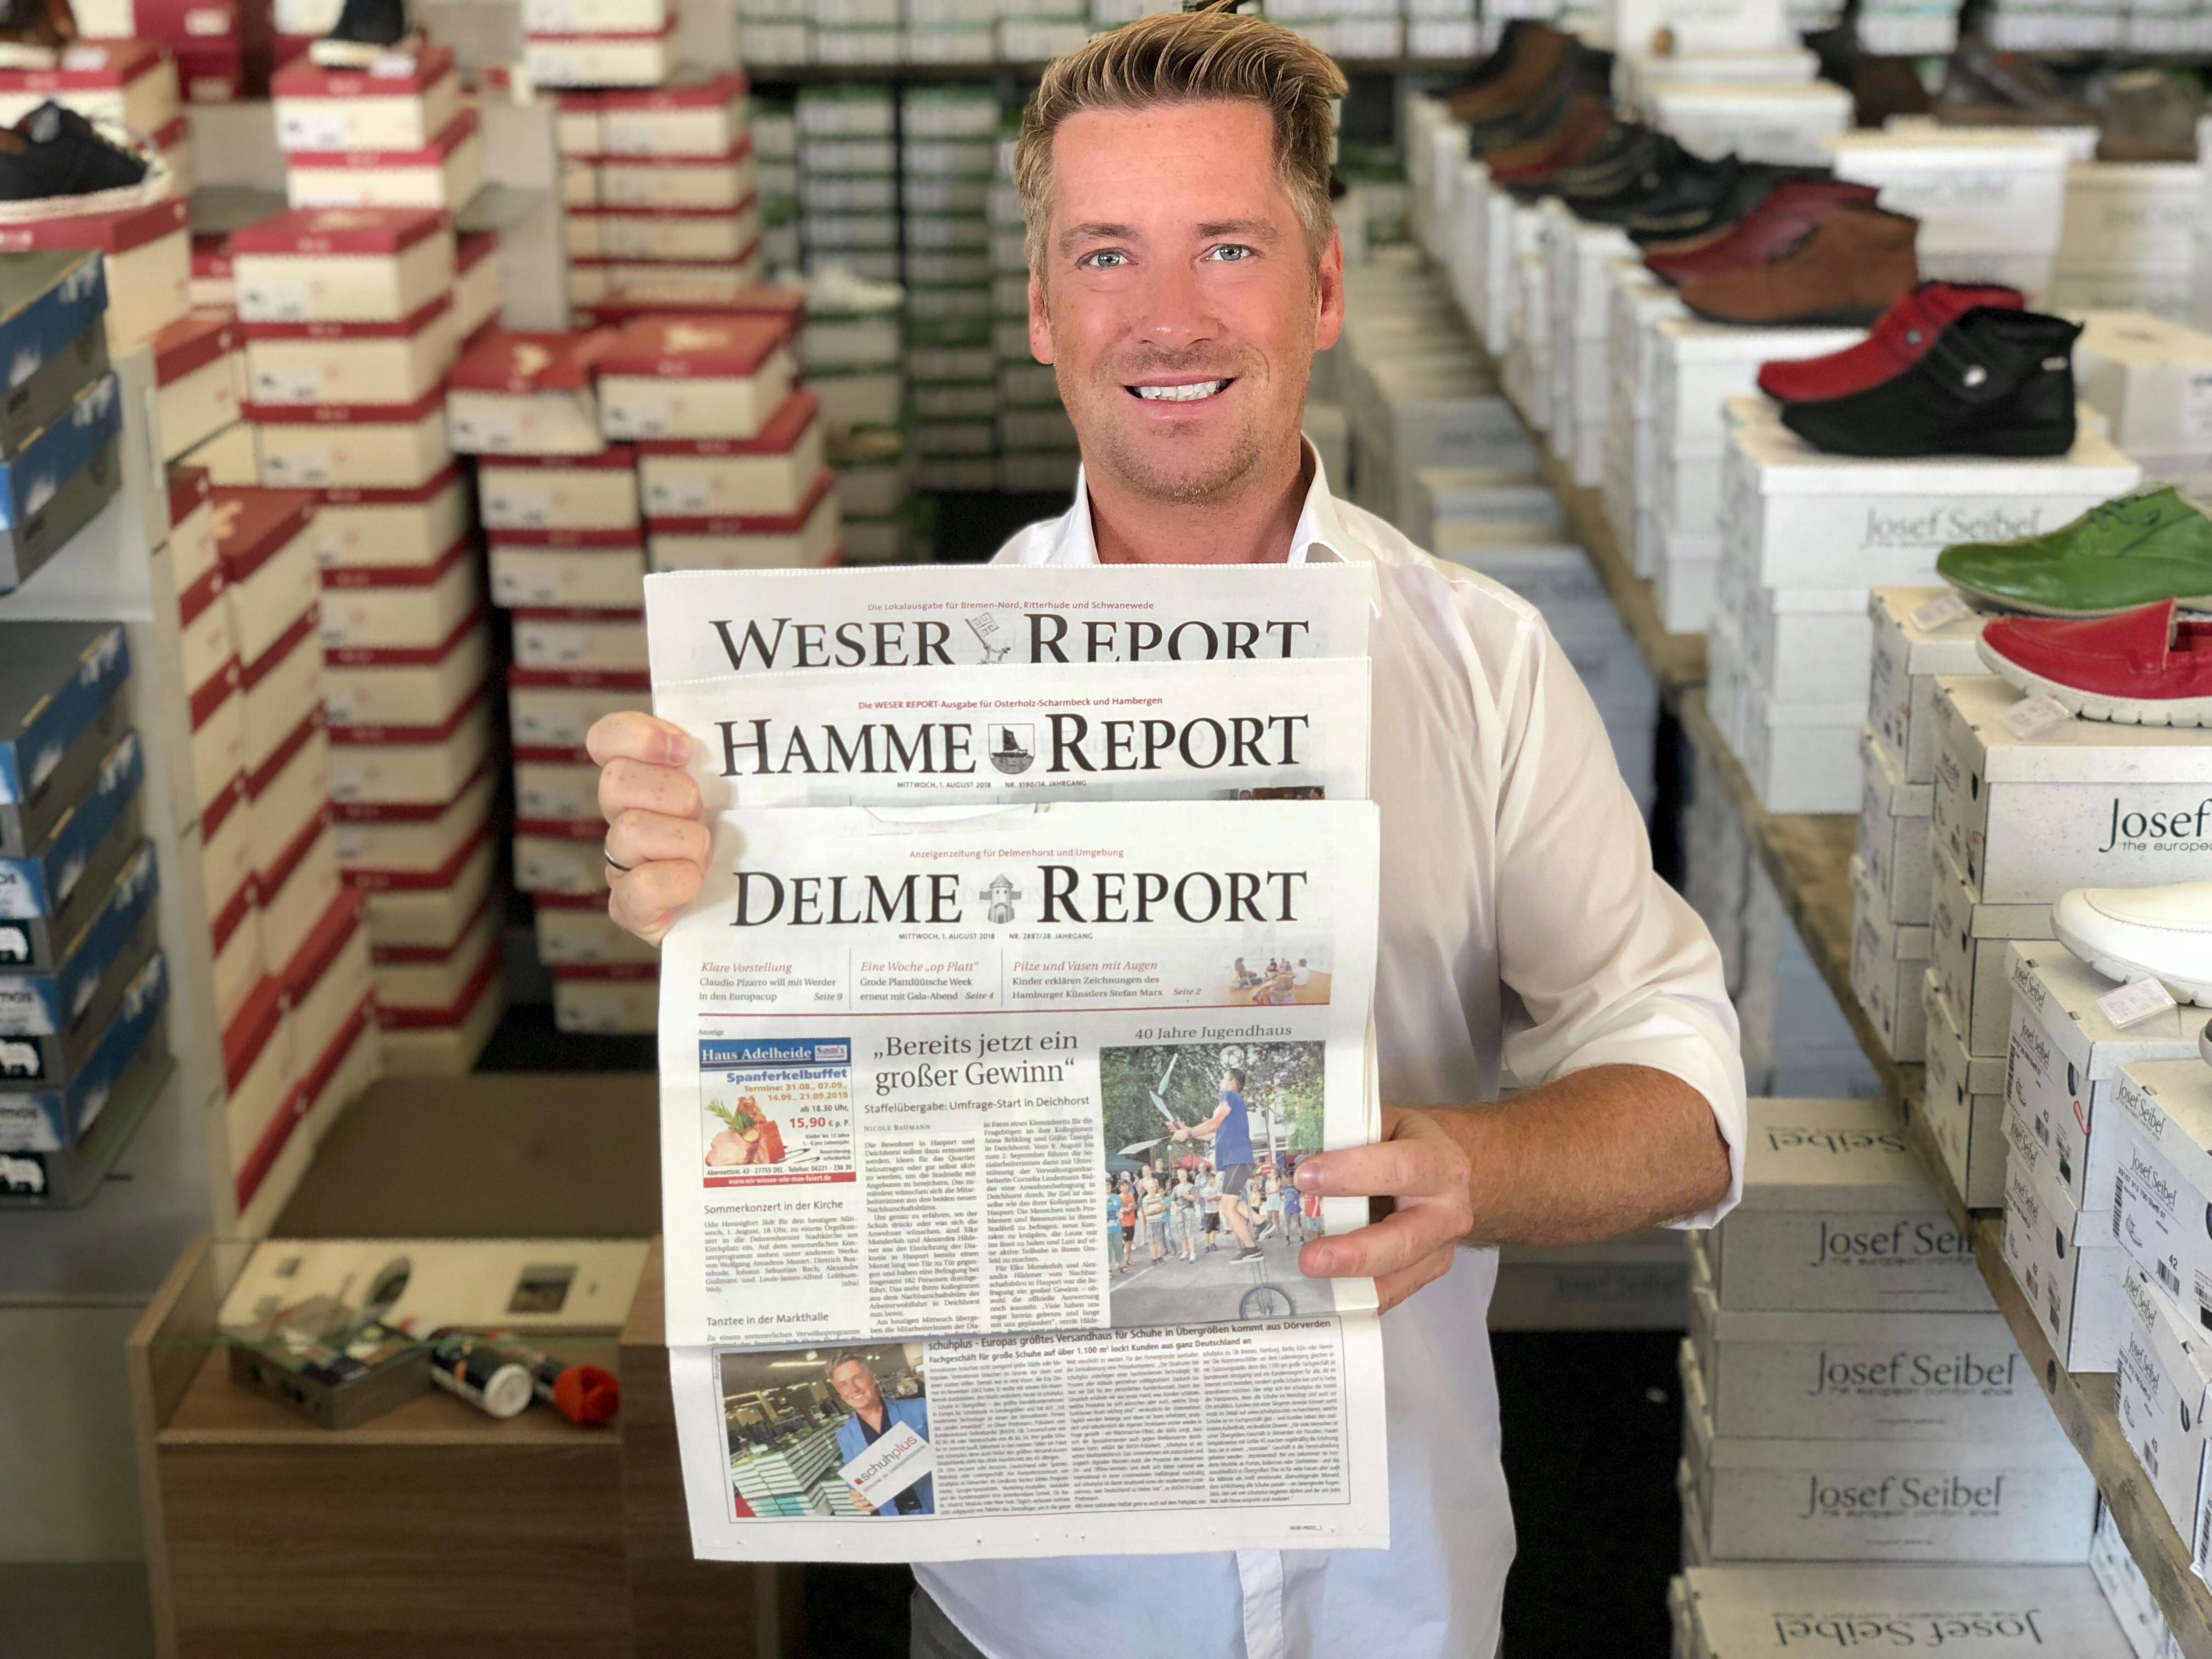 schuhplus im WESER REPORT, HAMME REPORT sowie DELME REPORT